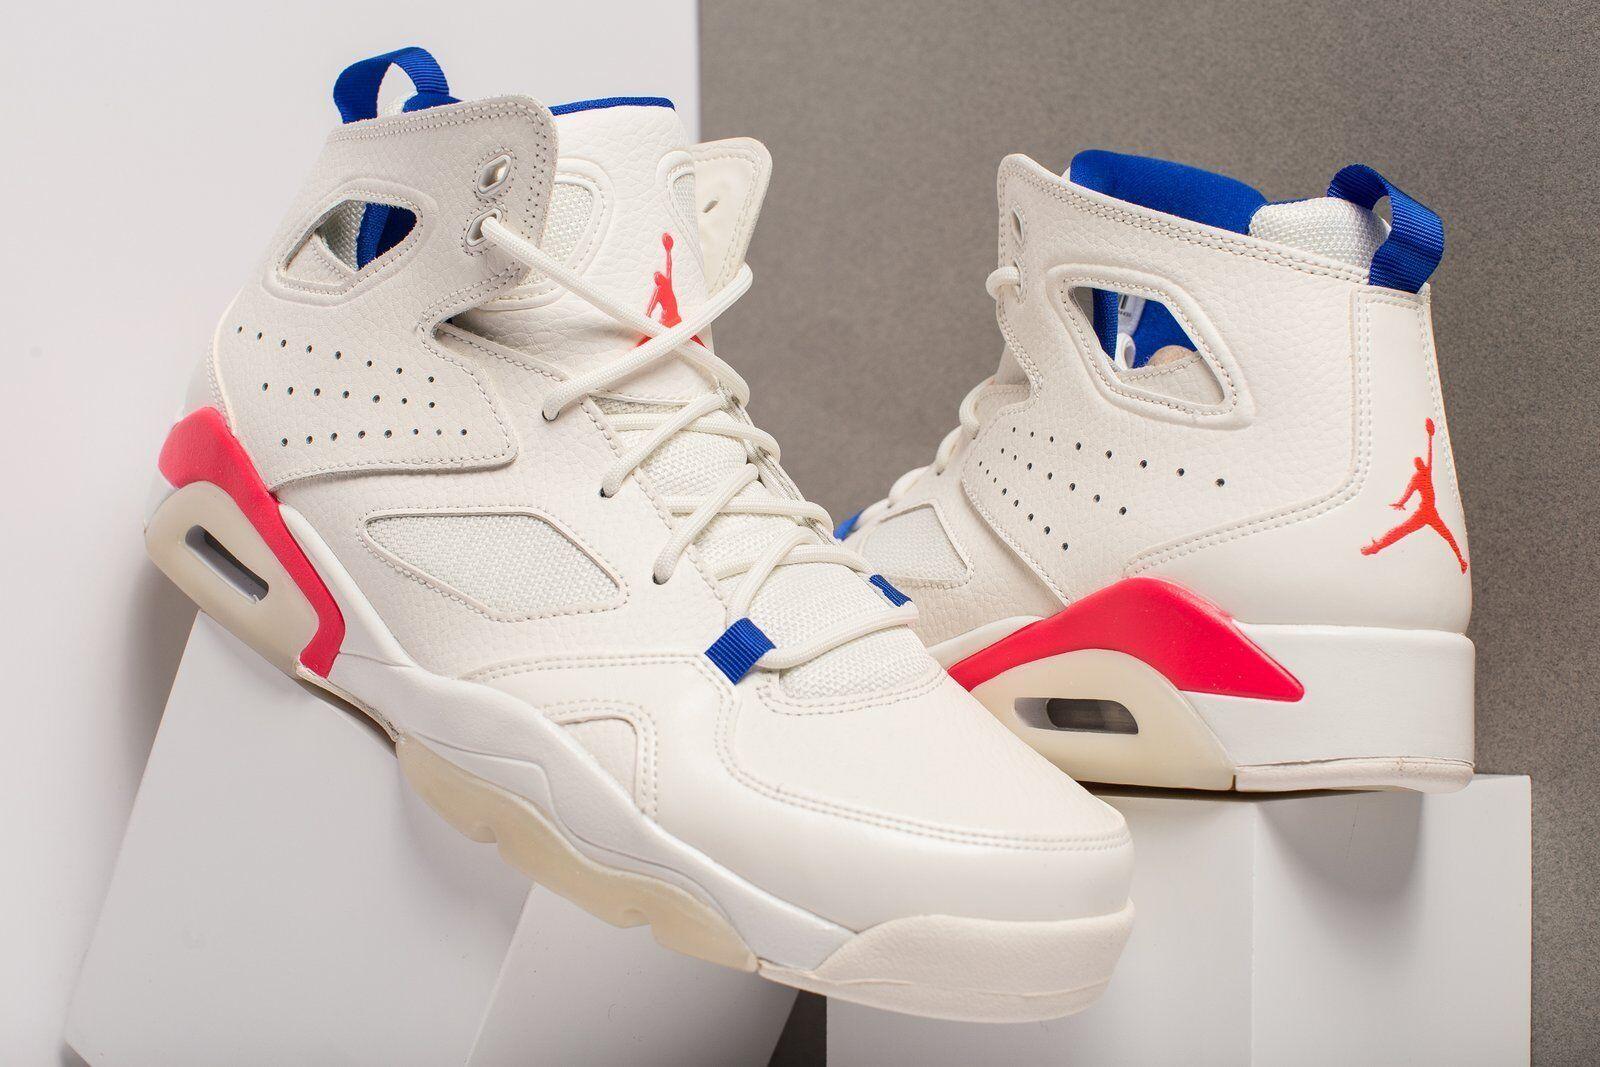 Nike Air Jordan Flight Club '91 Sail Racer Pink Men's Basketball shoes 555475-125